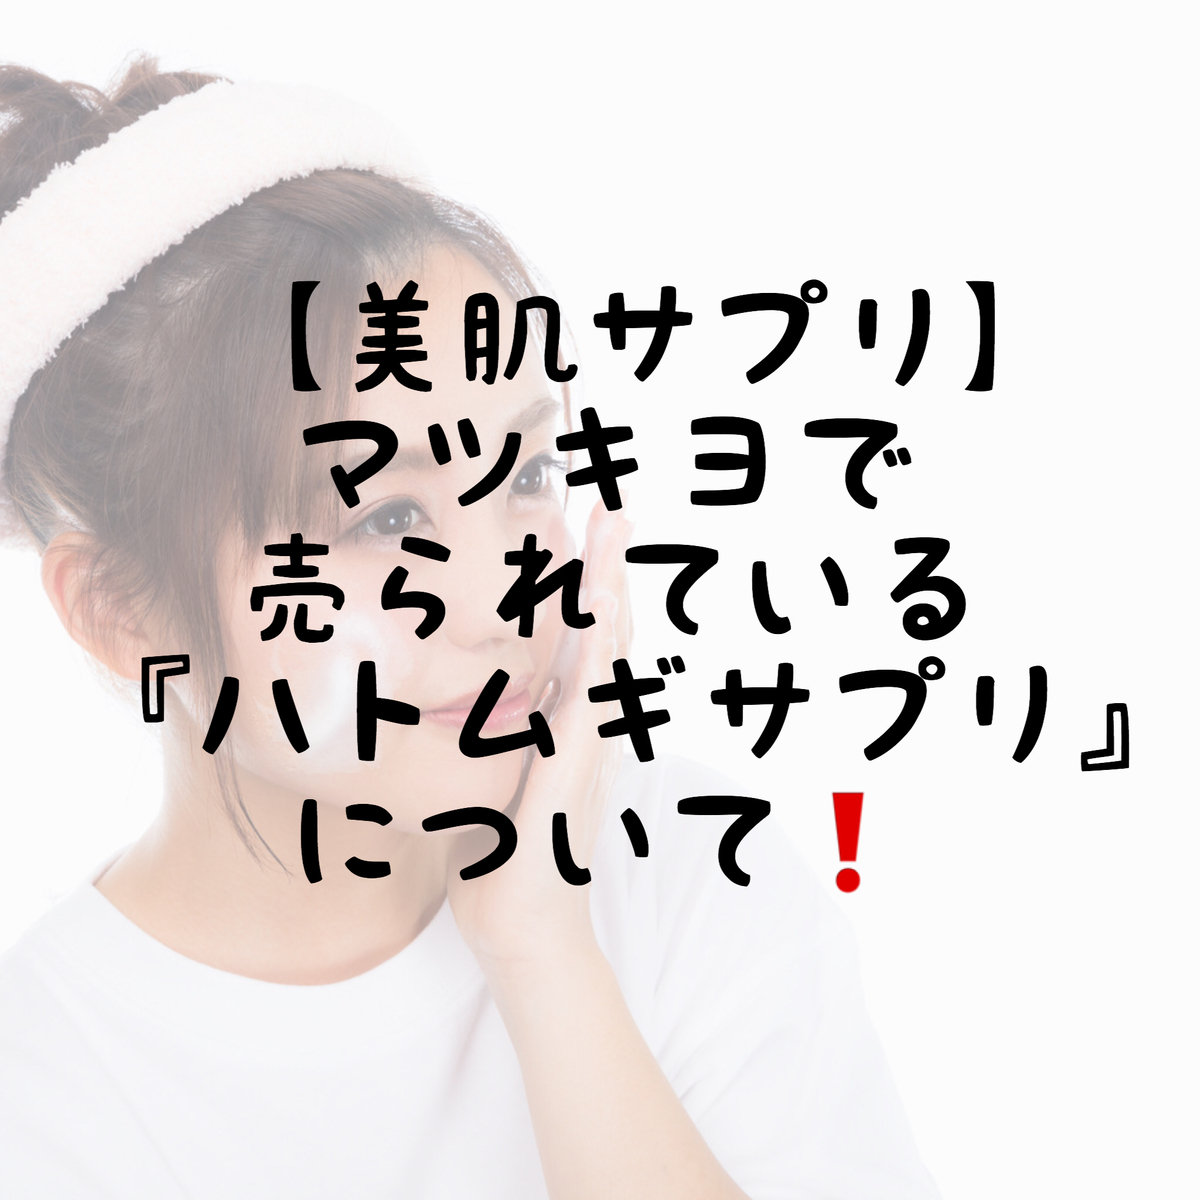 f:id:nokonoko_o:20200530151150j:plain